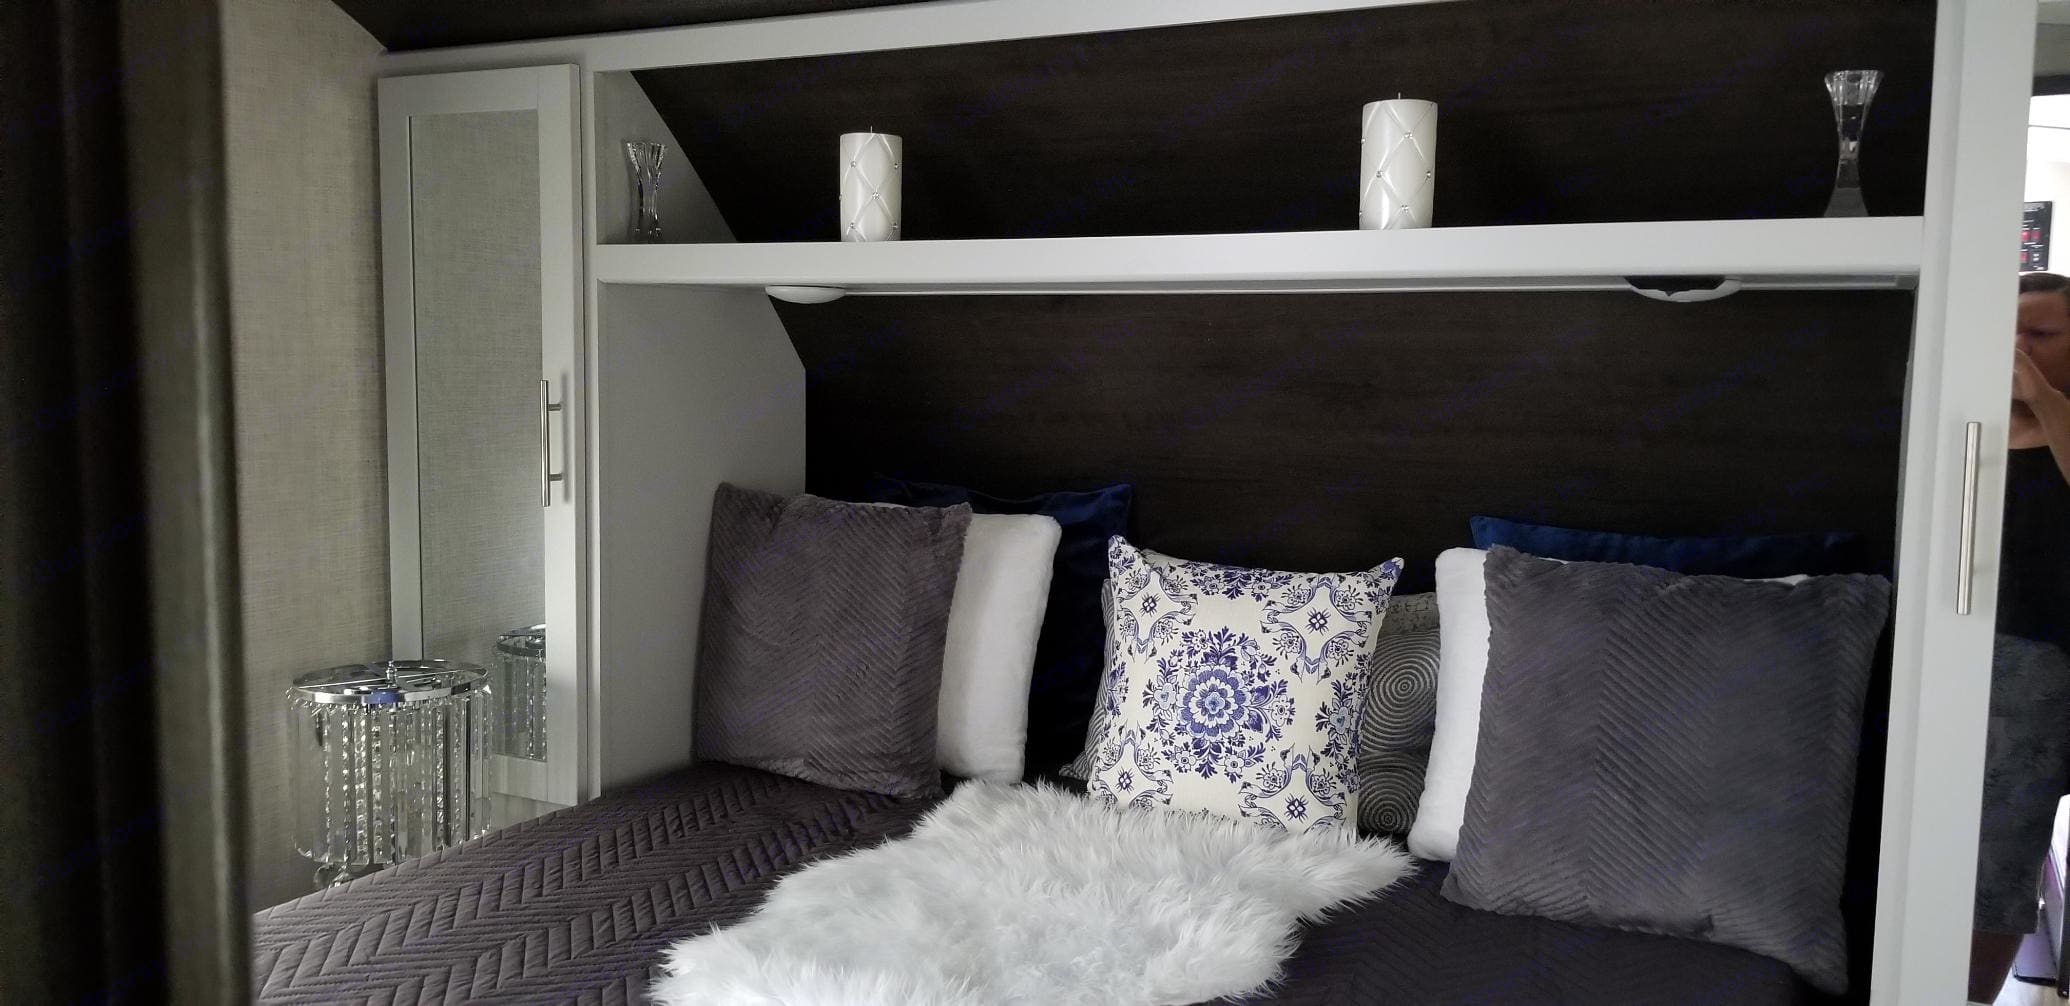 Bedroom. Keystone Premier 2020